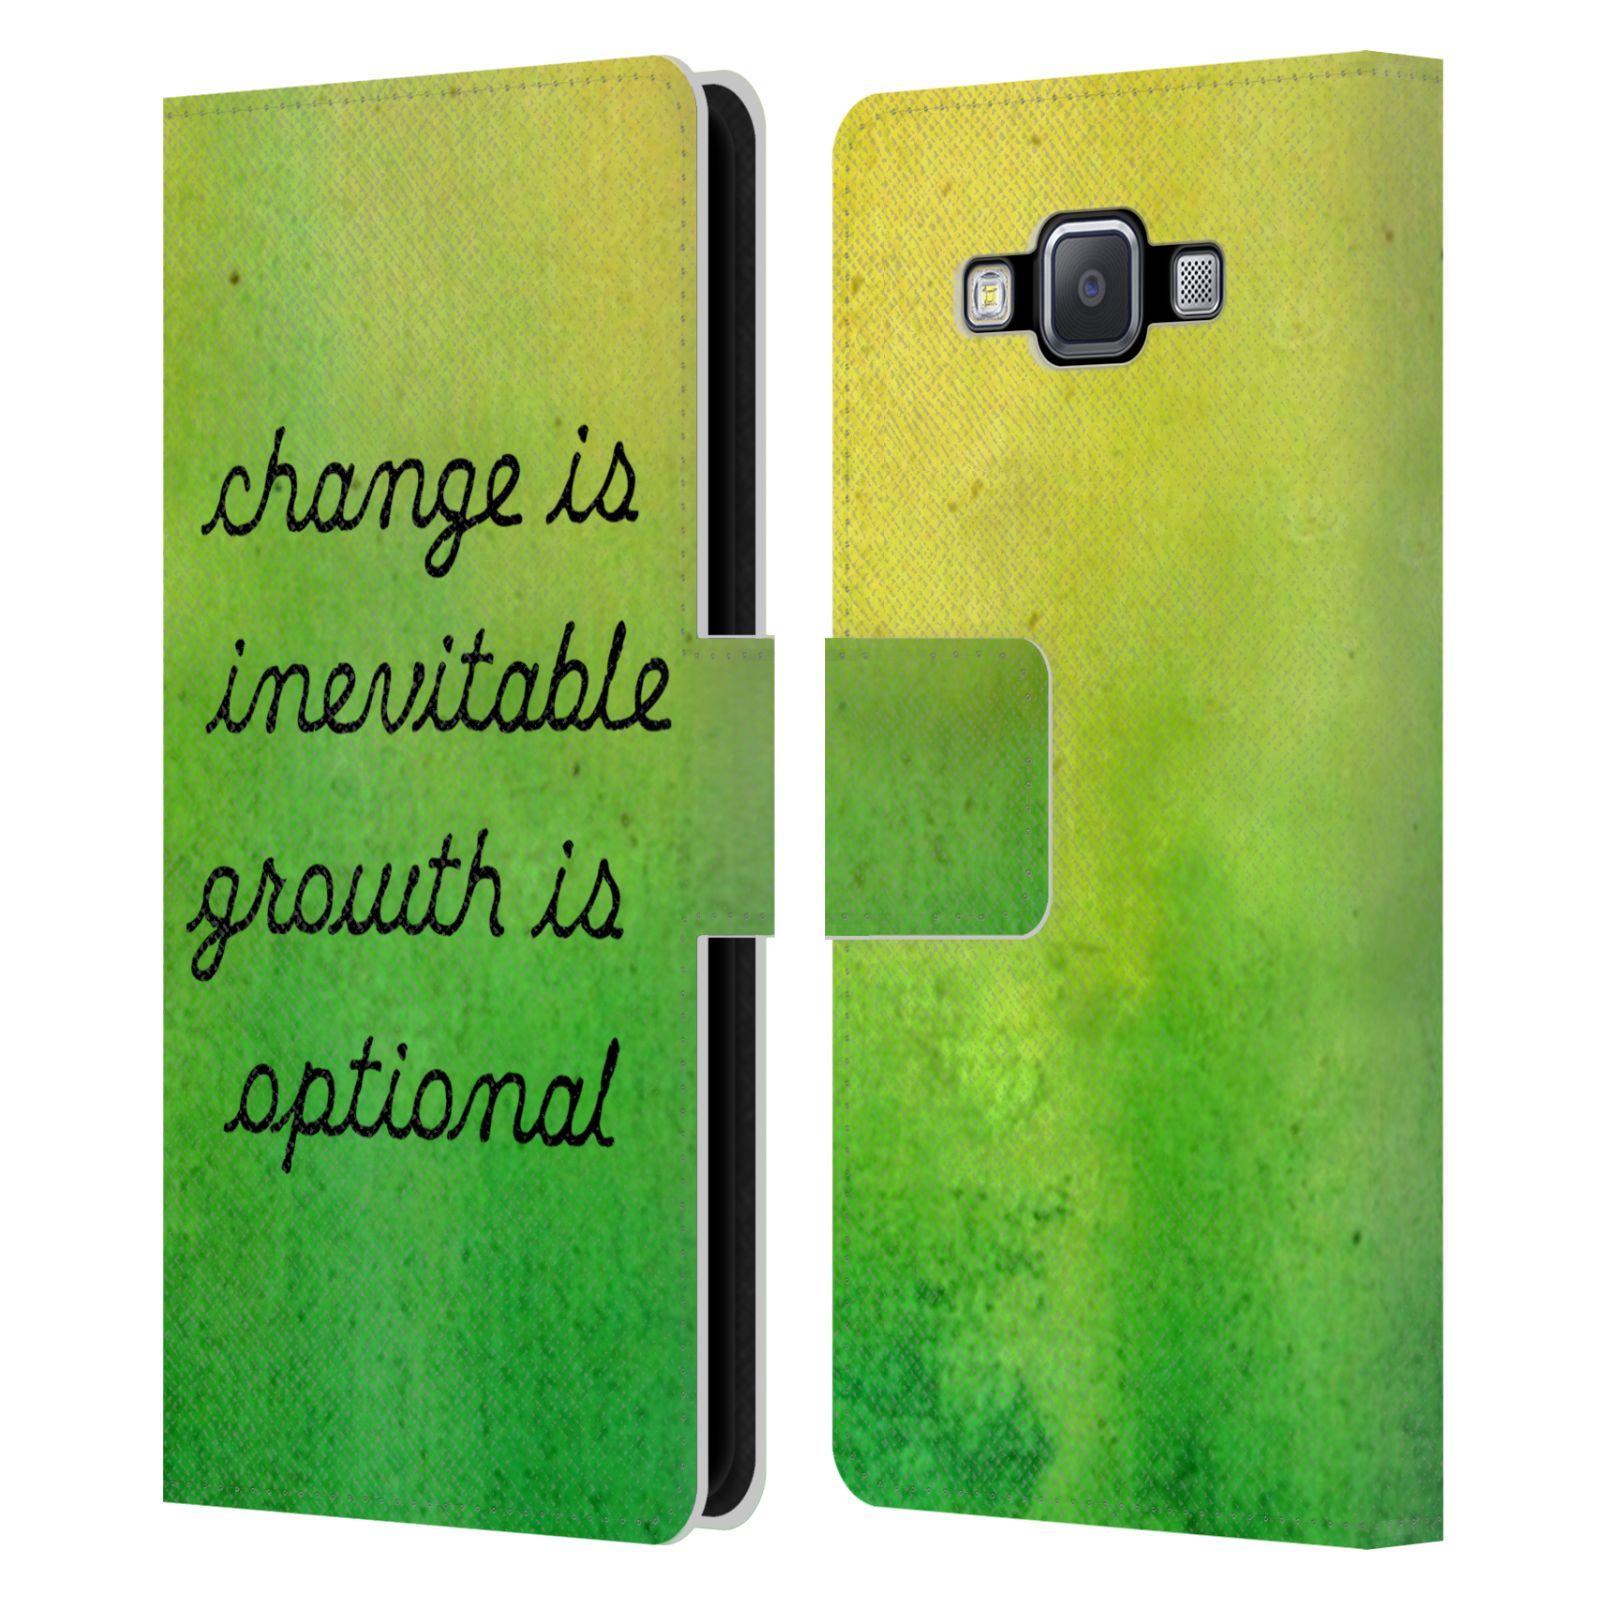 OFFICIAL-BRIGID-ASHWOOD-INSPIRATIONAL-2-LEATHER-BOOK-CASE-FOR-SAMSUNG-PHONES-2